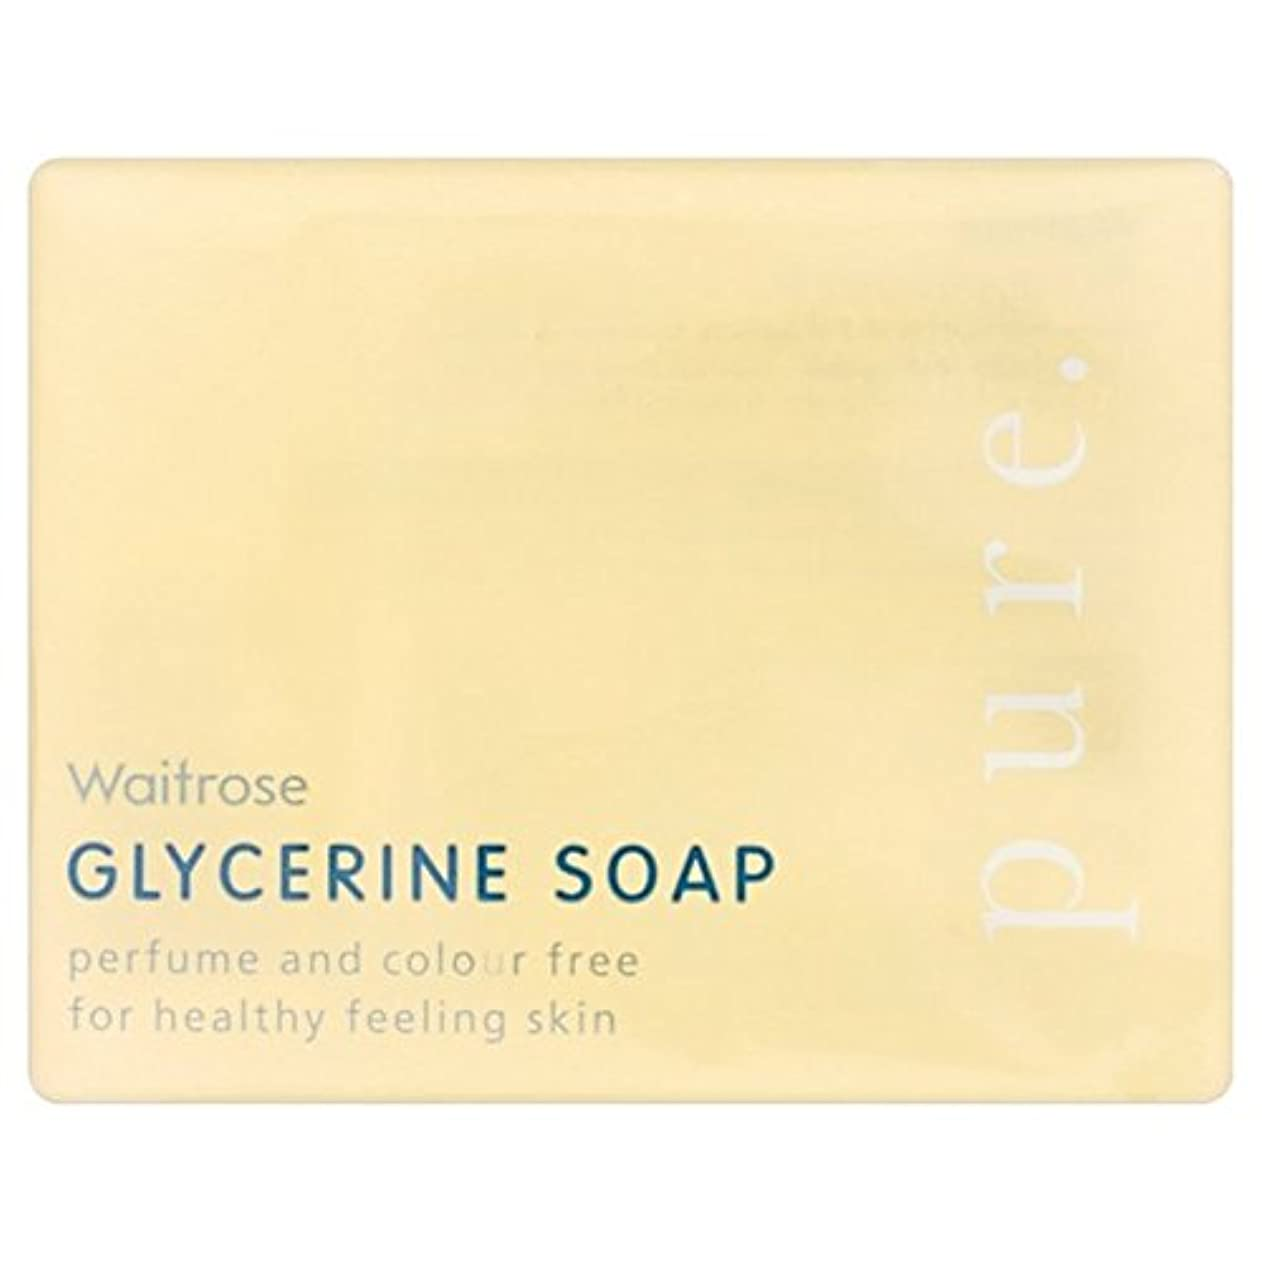 Pure Glycerine Soap Waitrose 100g - 純粋なグリセリンソープウェイトローズの100グラム [並行輸入品]